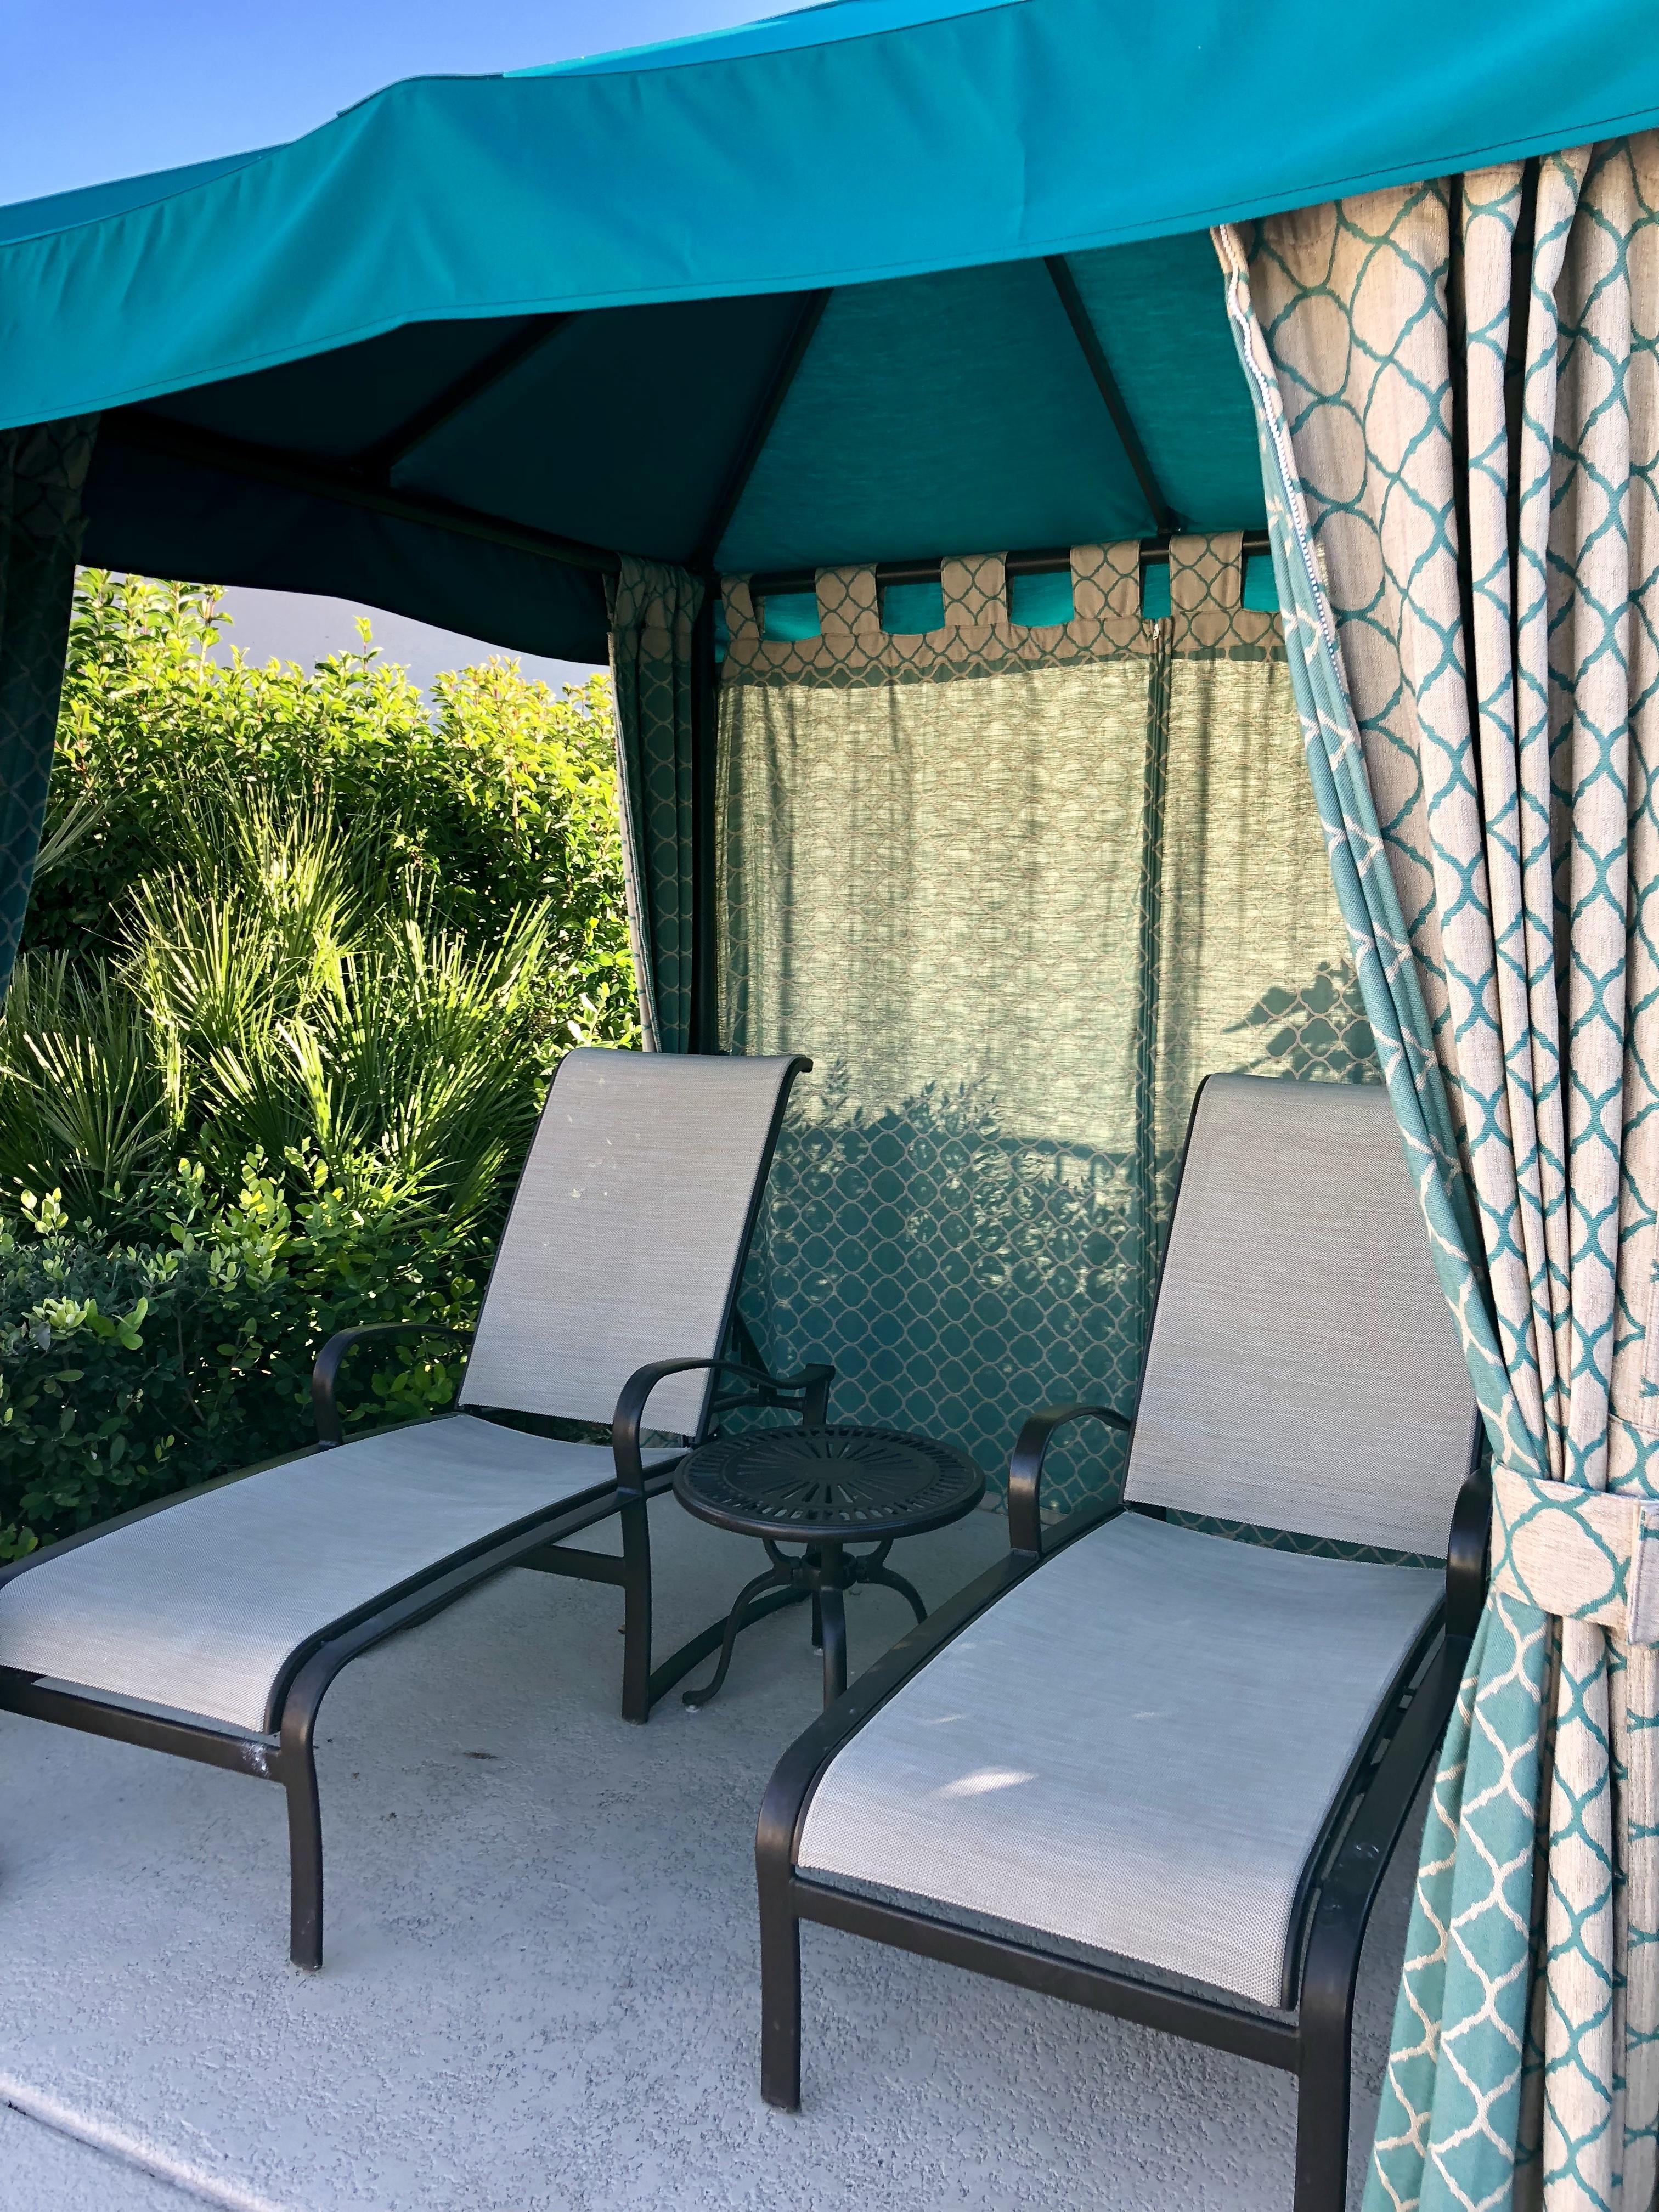 shade cabanas free of charge